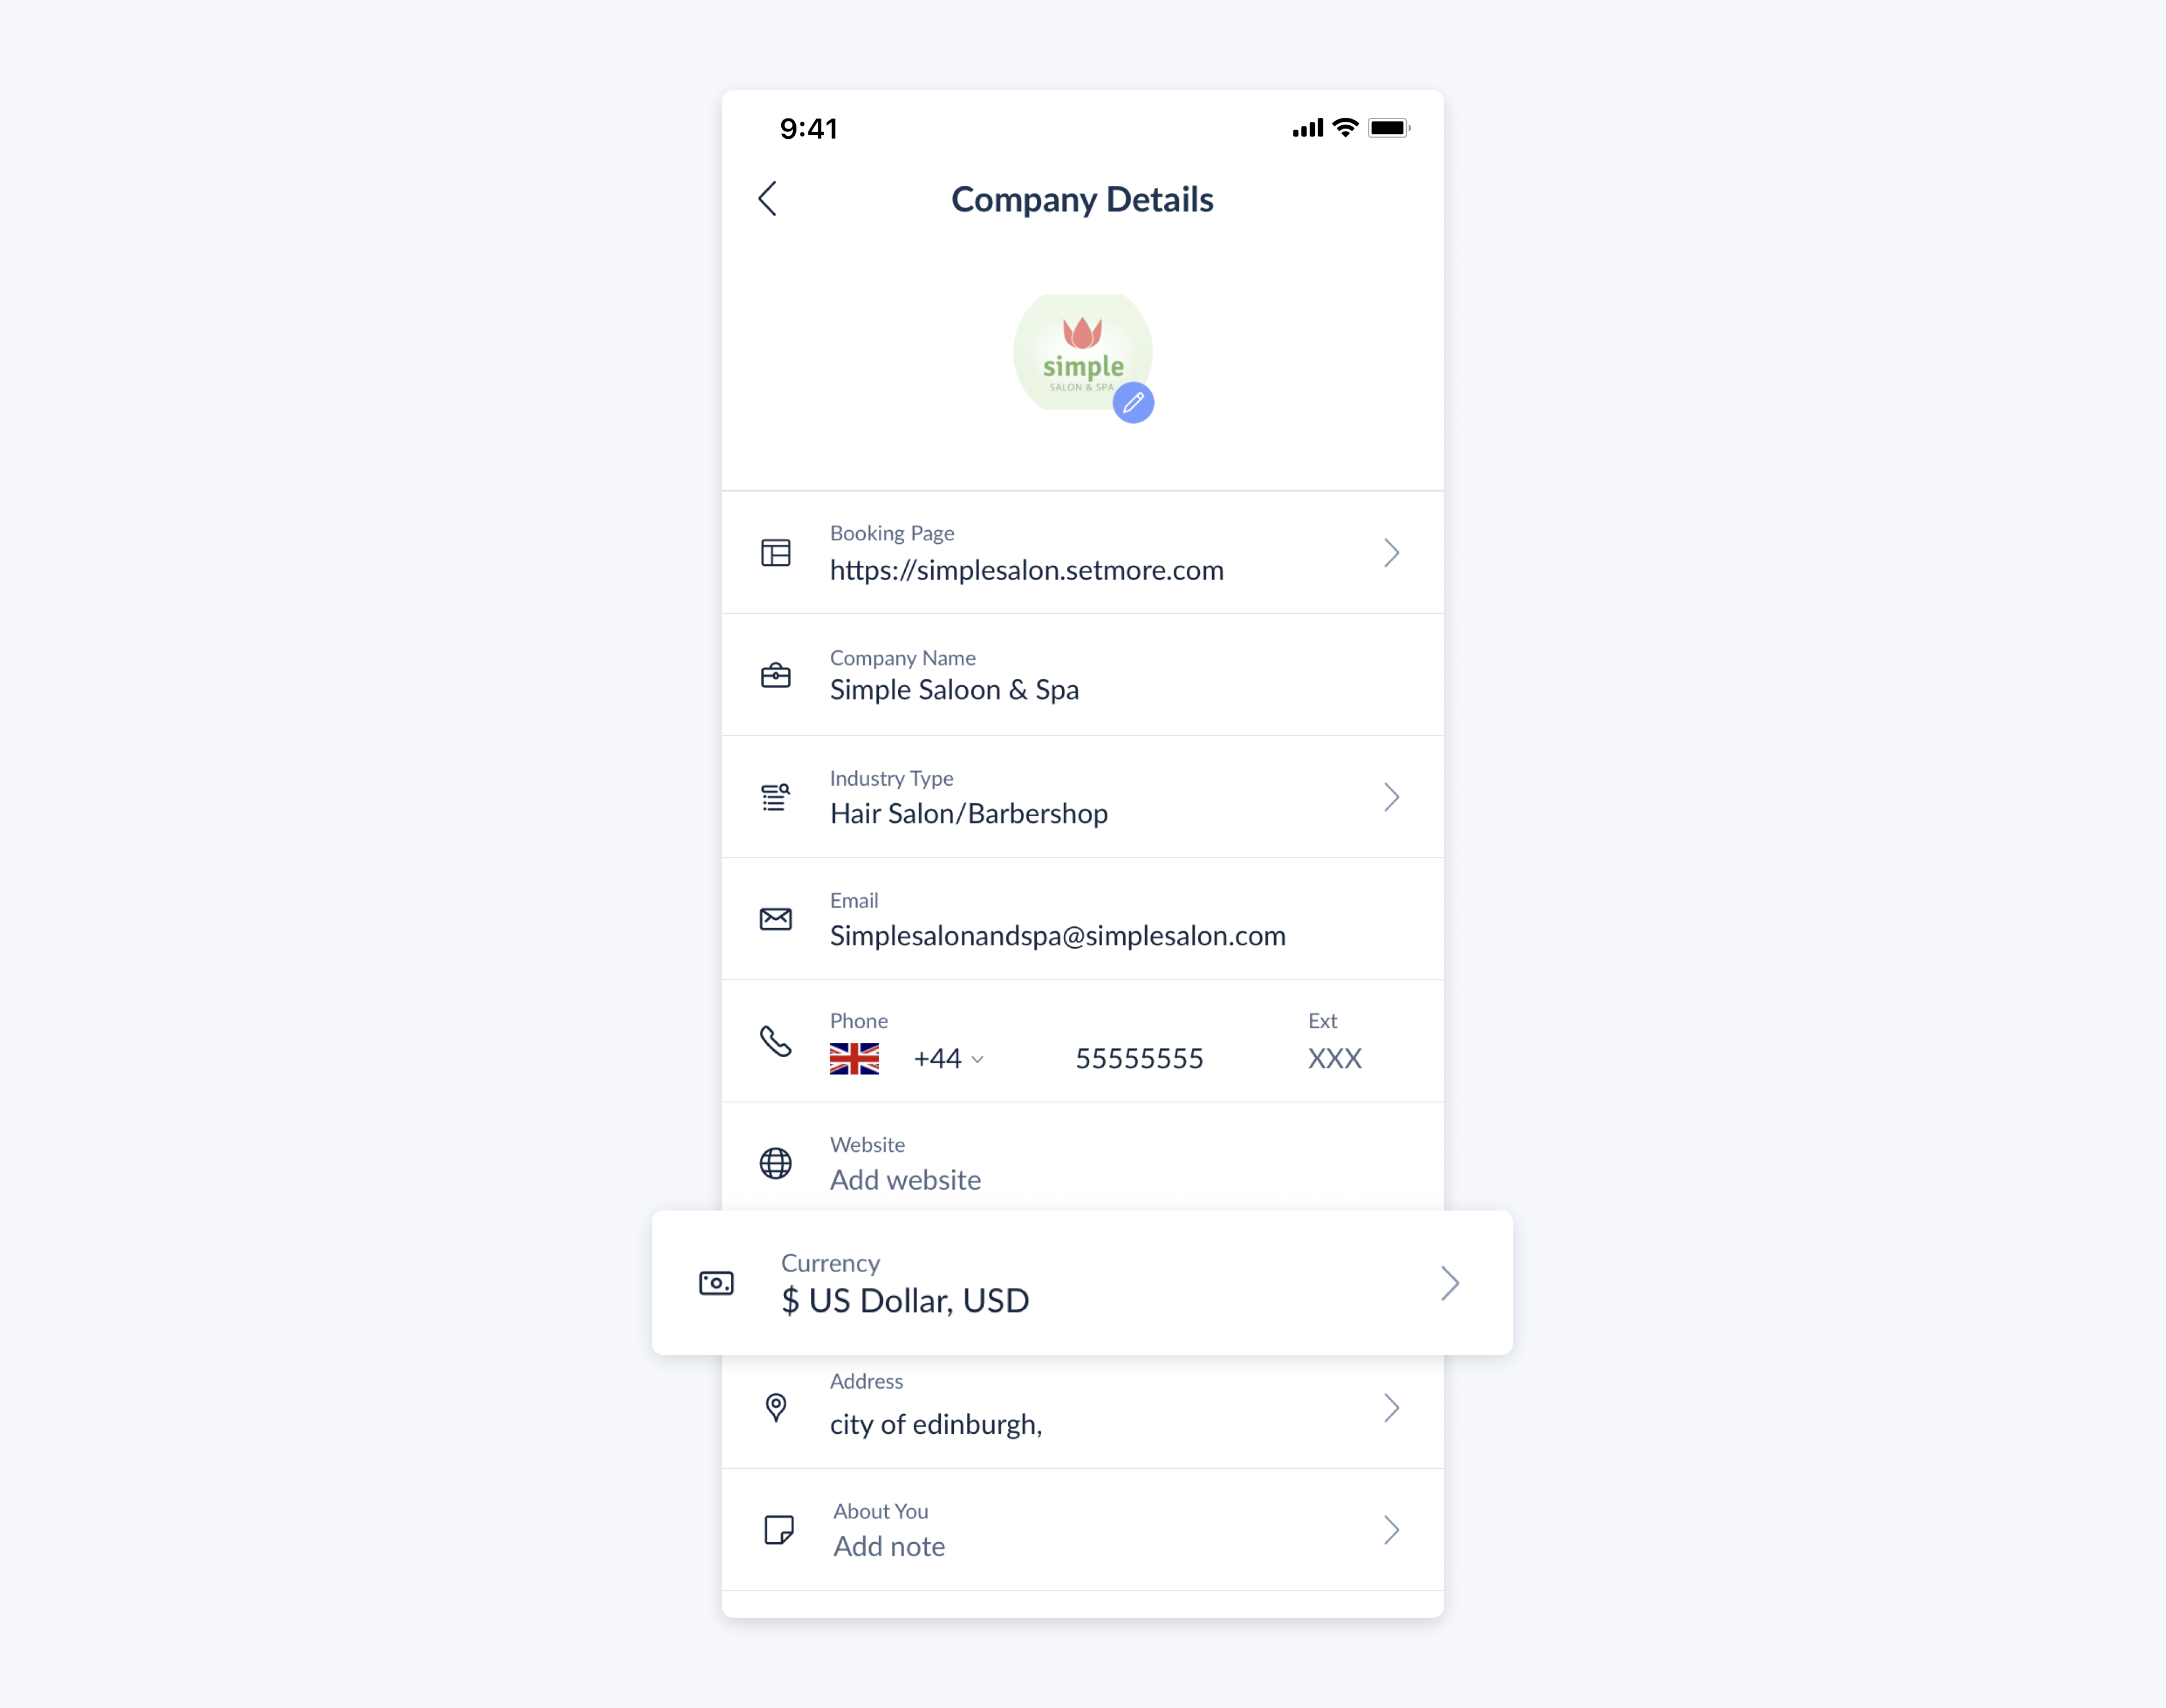 setmore mobile app company details menu